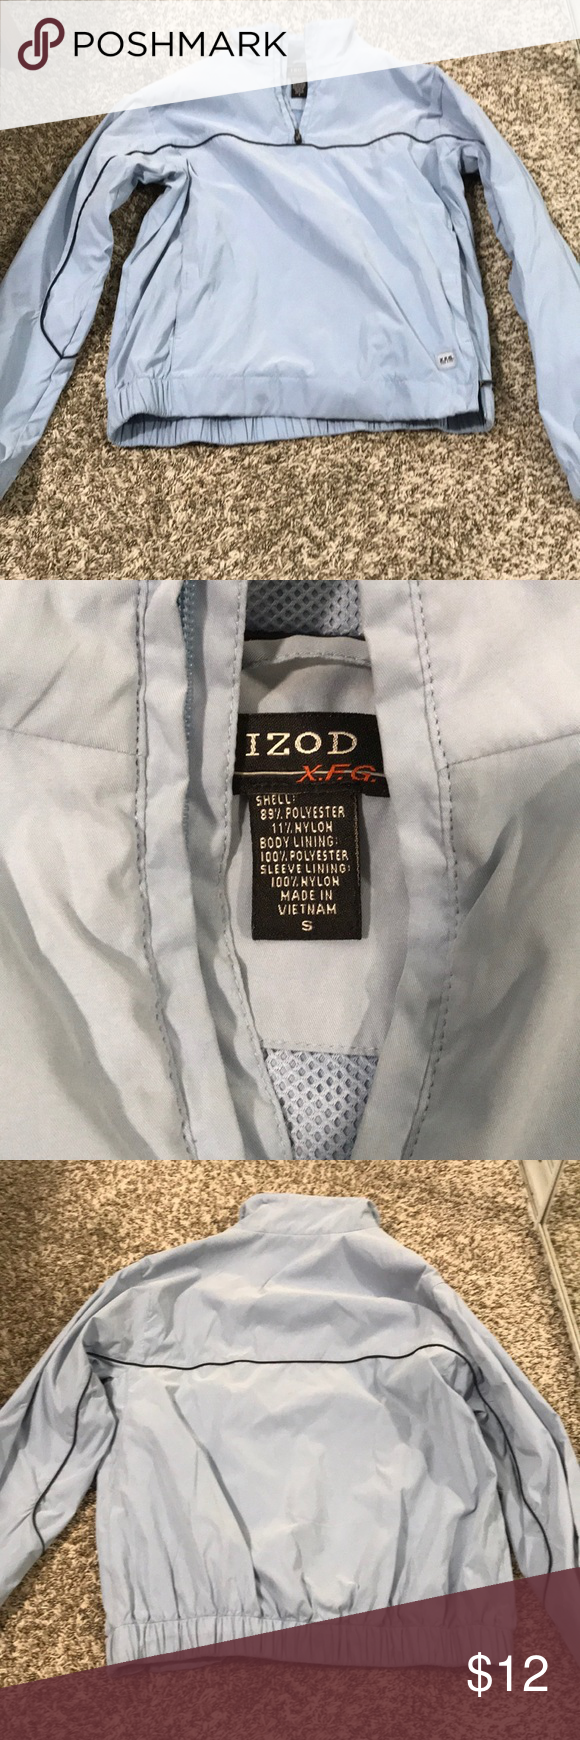 Izod Jacket Izod Jackets Clothes Design [ 1740 x 580 Pixel ]